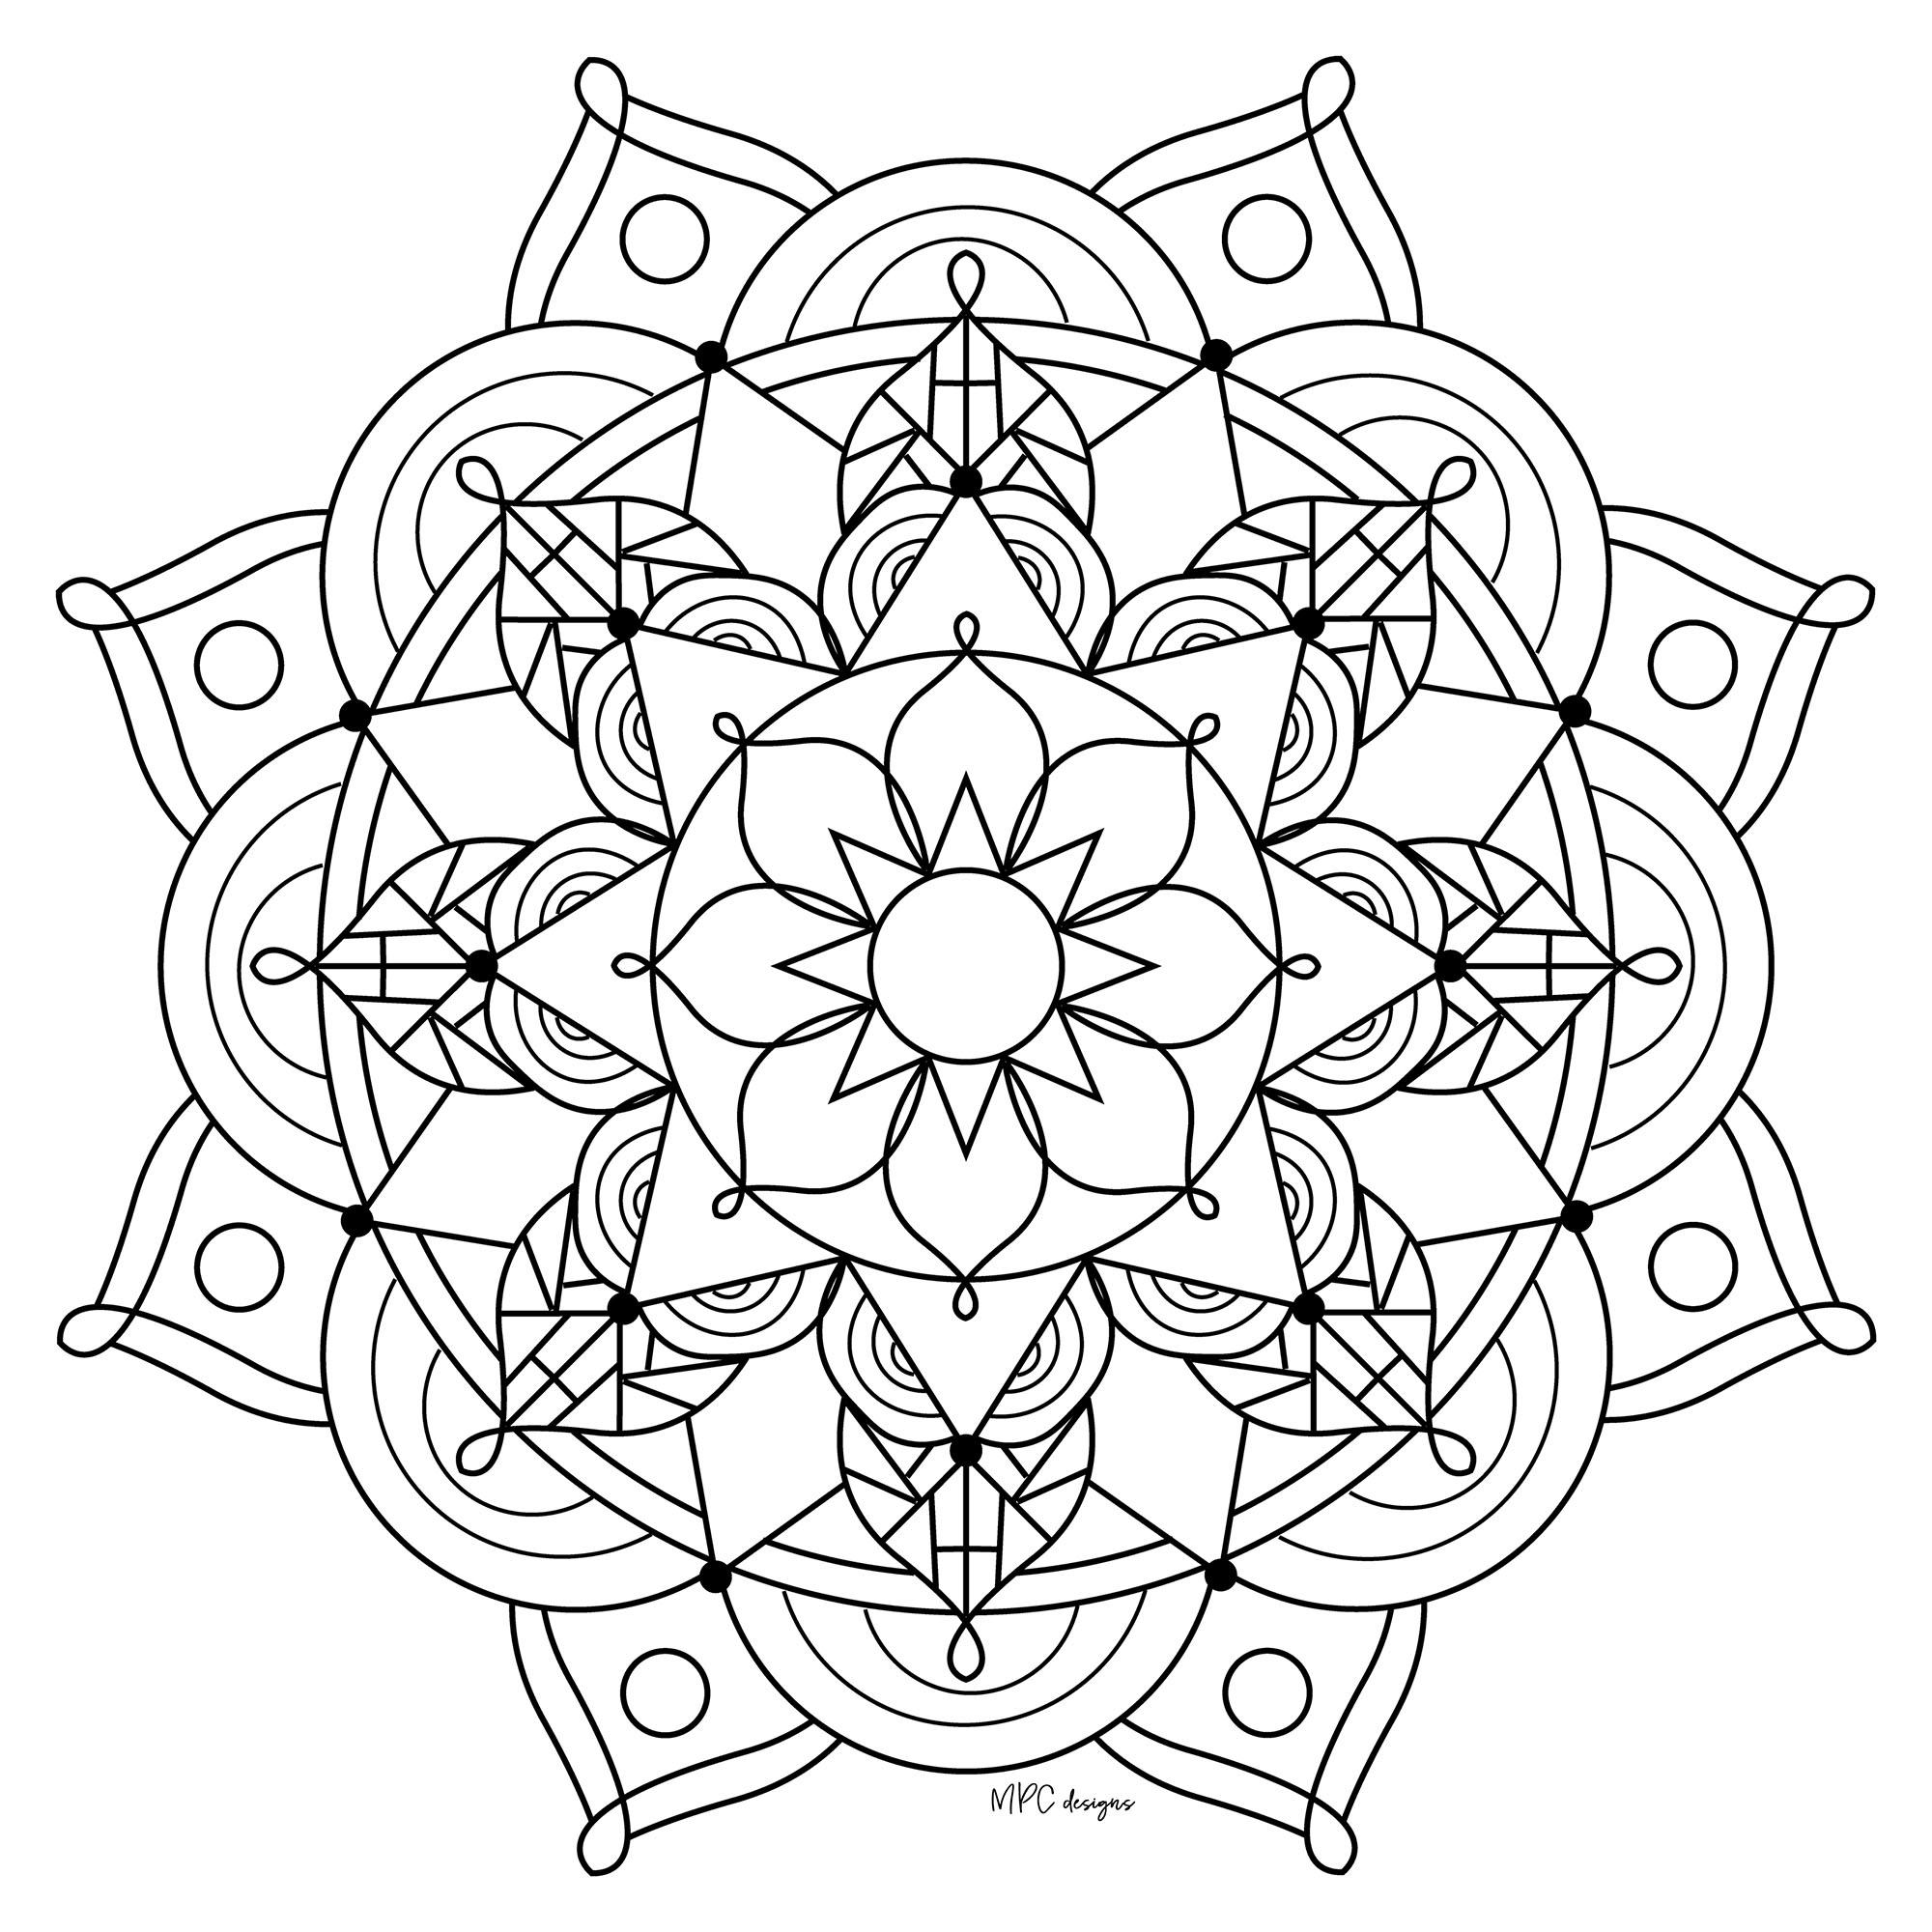 Coloriage Adulte Mandala A Imprimer.Mandala Mpc Design 10 Mandalas Coloriages Difficiles